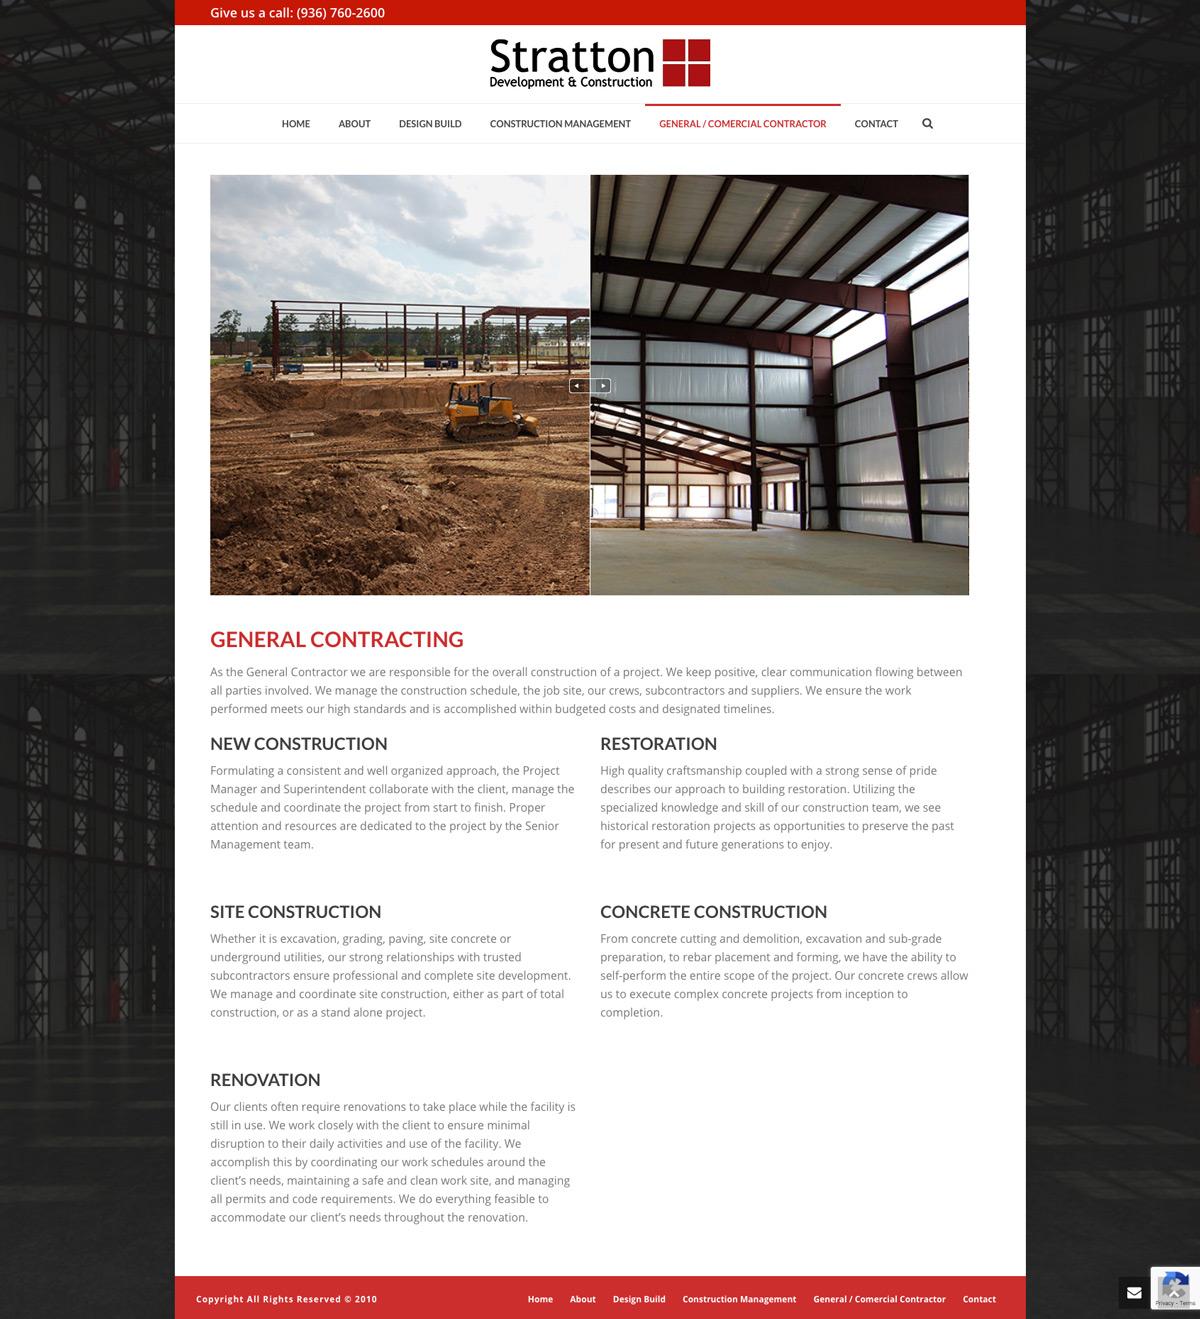 woodlands-construction-website-builder-5